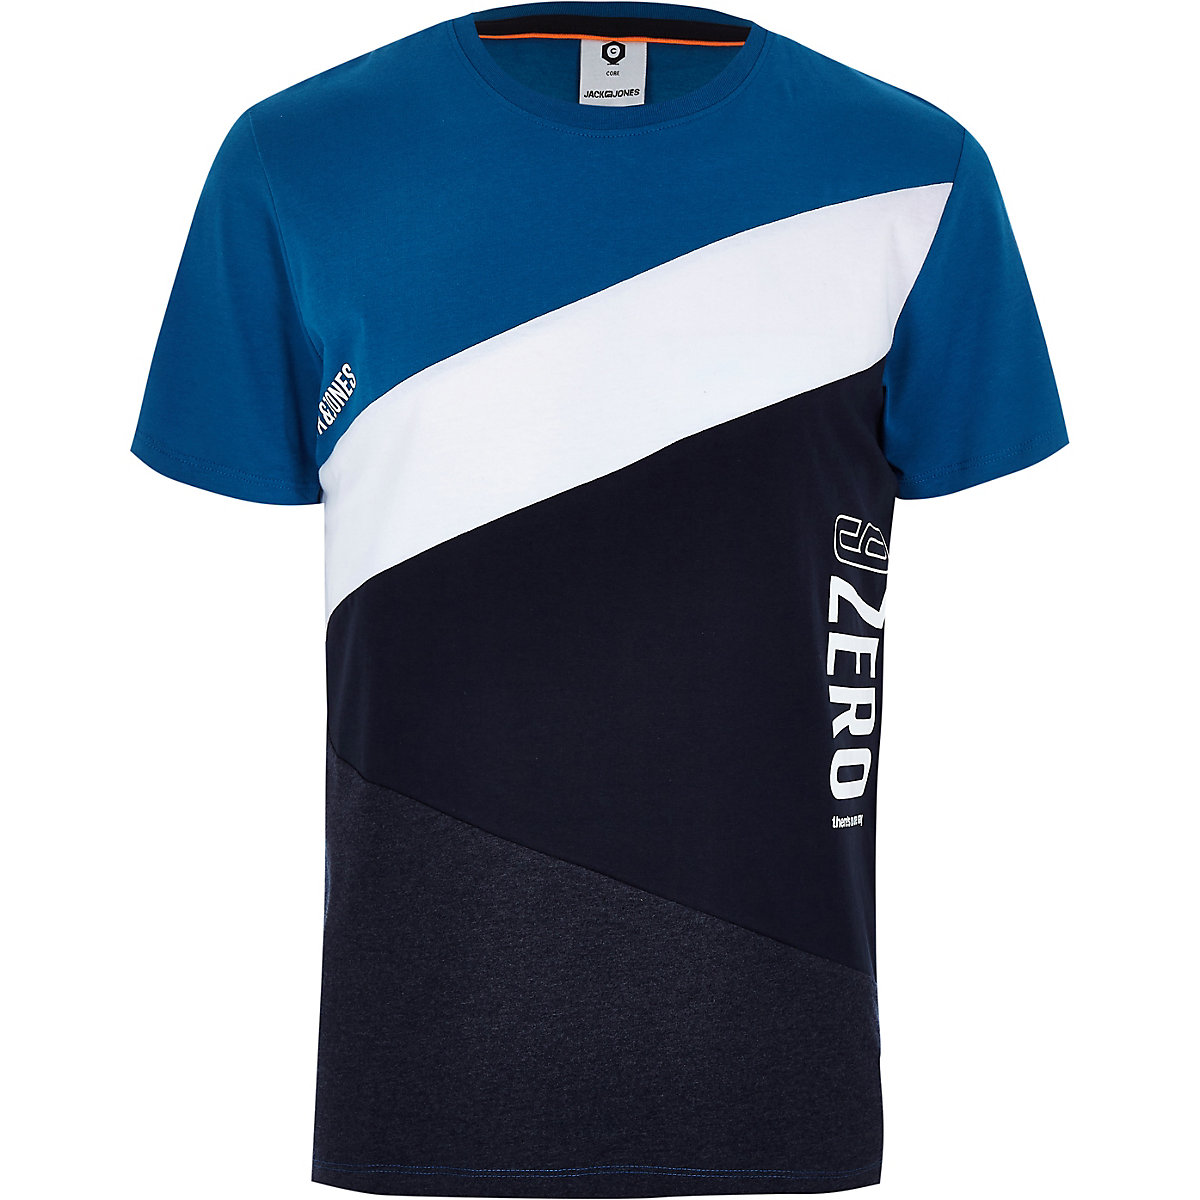 Jack & Jones blue colour block T-shirt